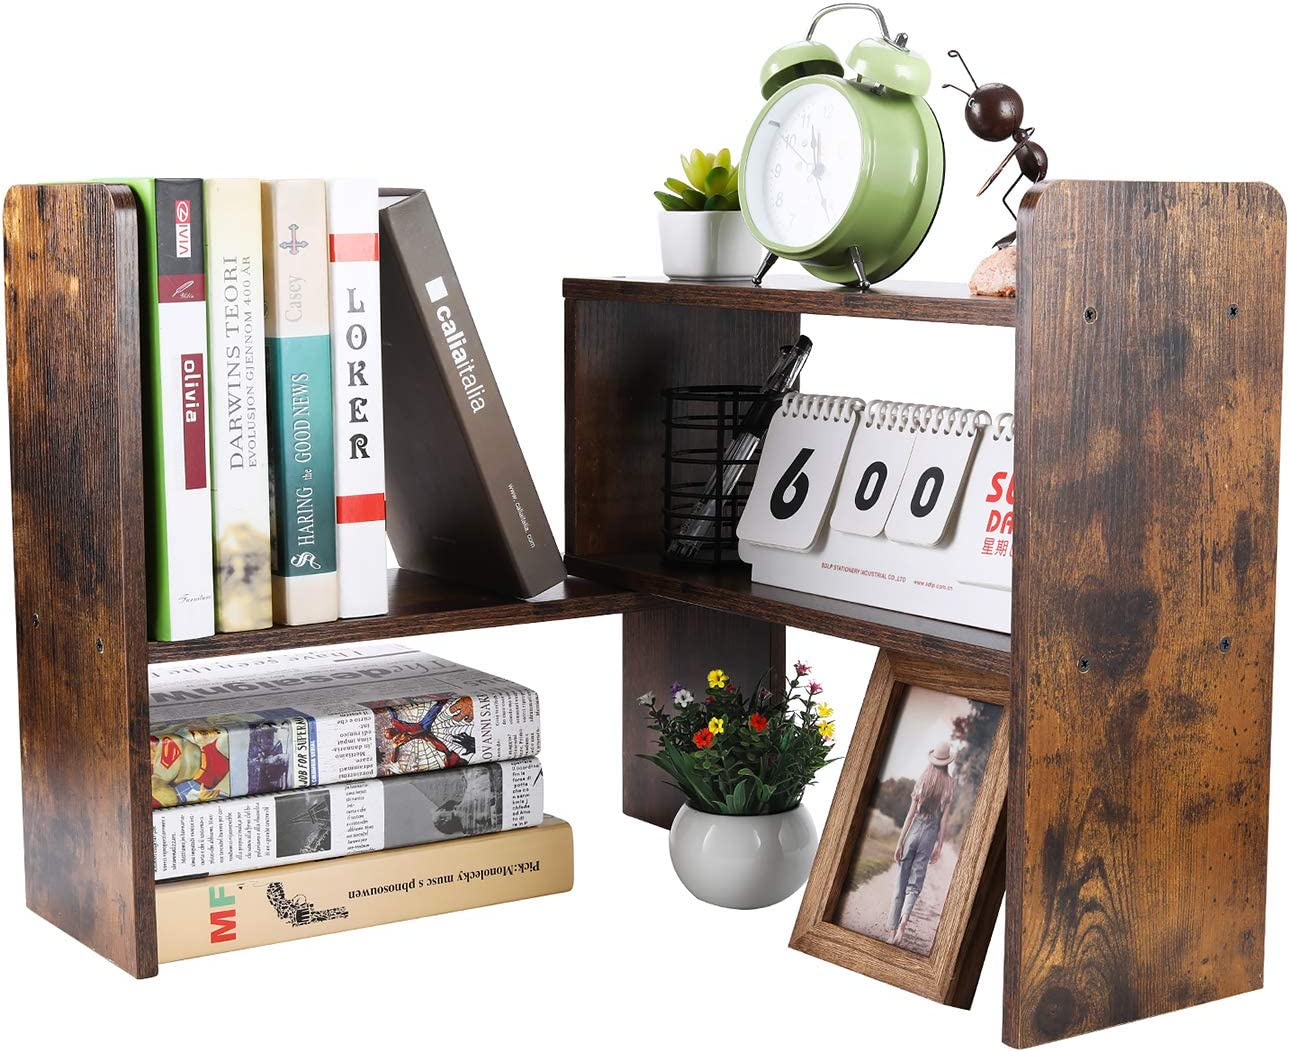 PAG Desktop Bookshelf Adjustable Countertop Bookcase Office Supplies Wood Desk Organizer Accessories Display Rack, Retro Brown